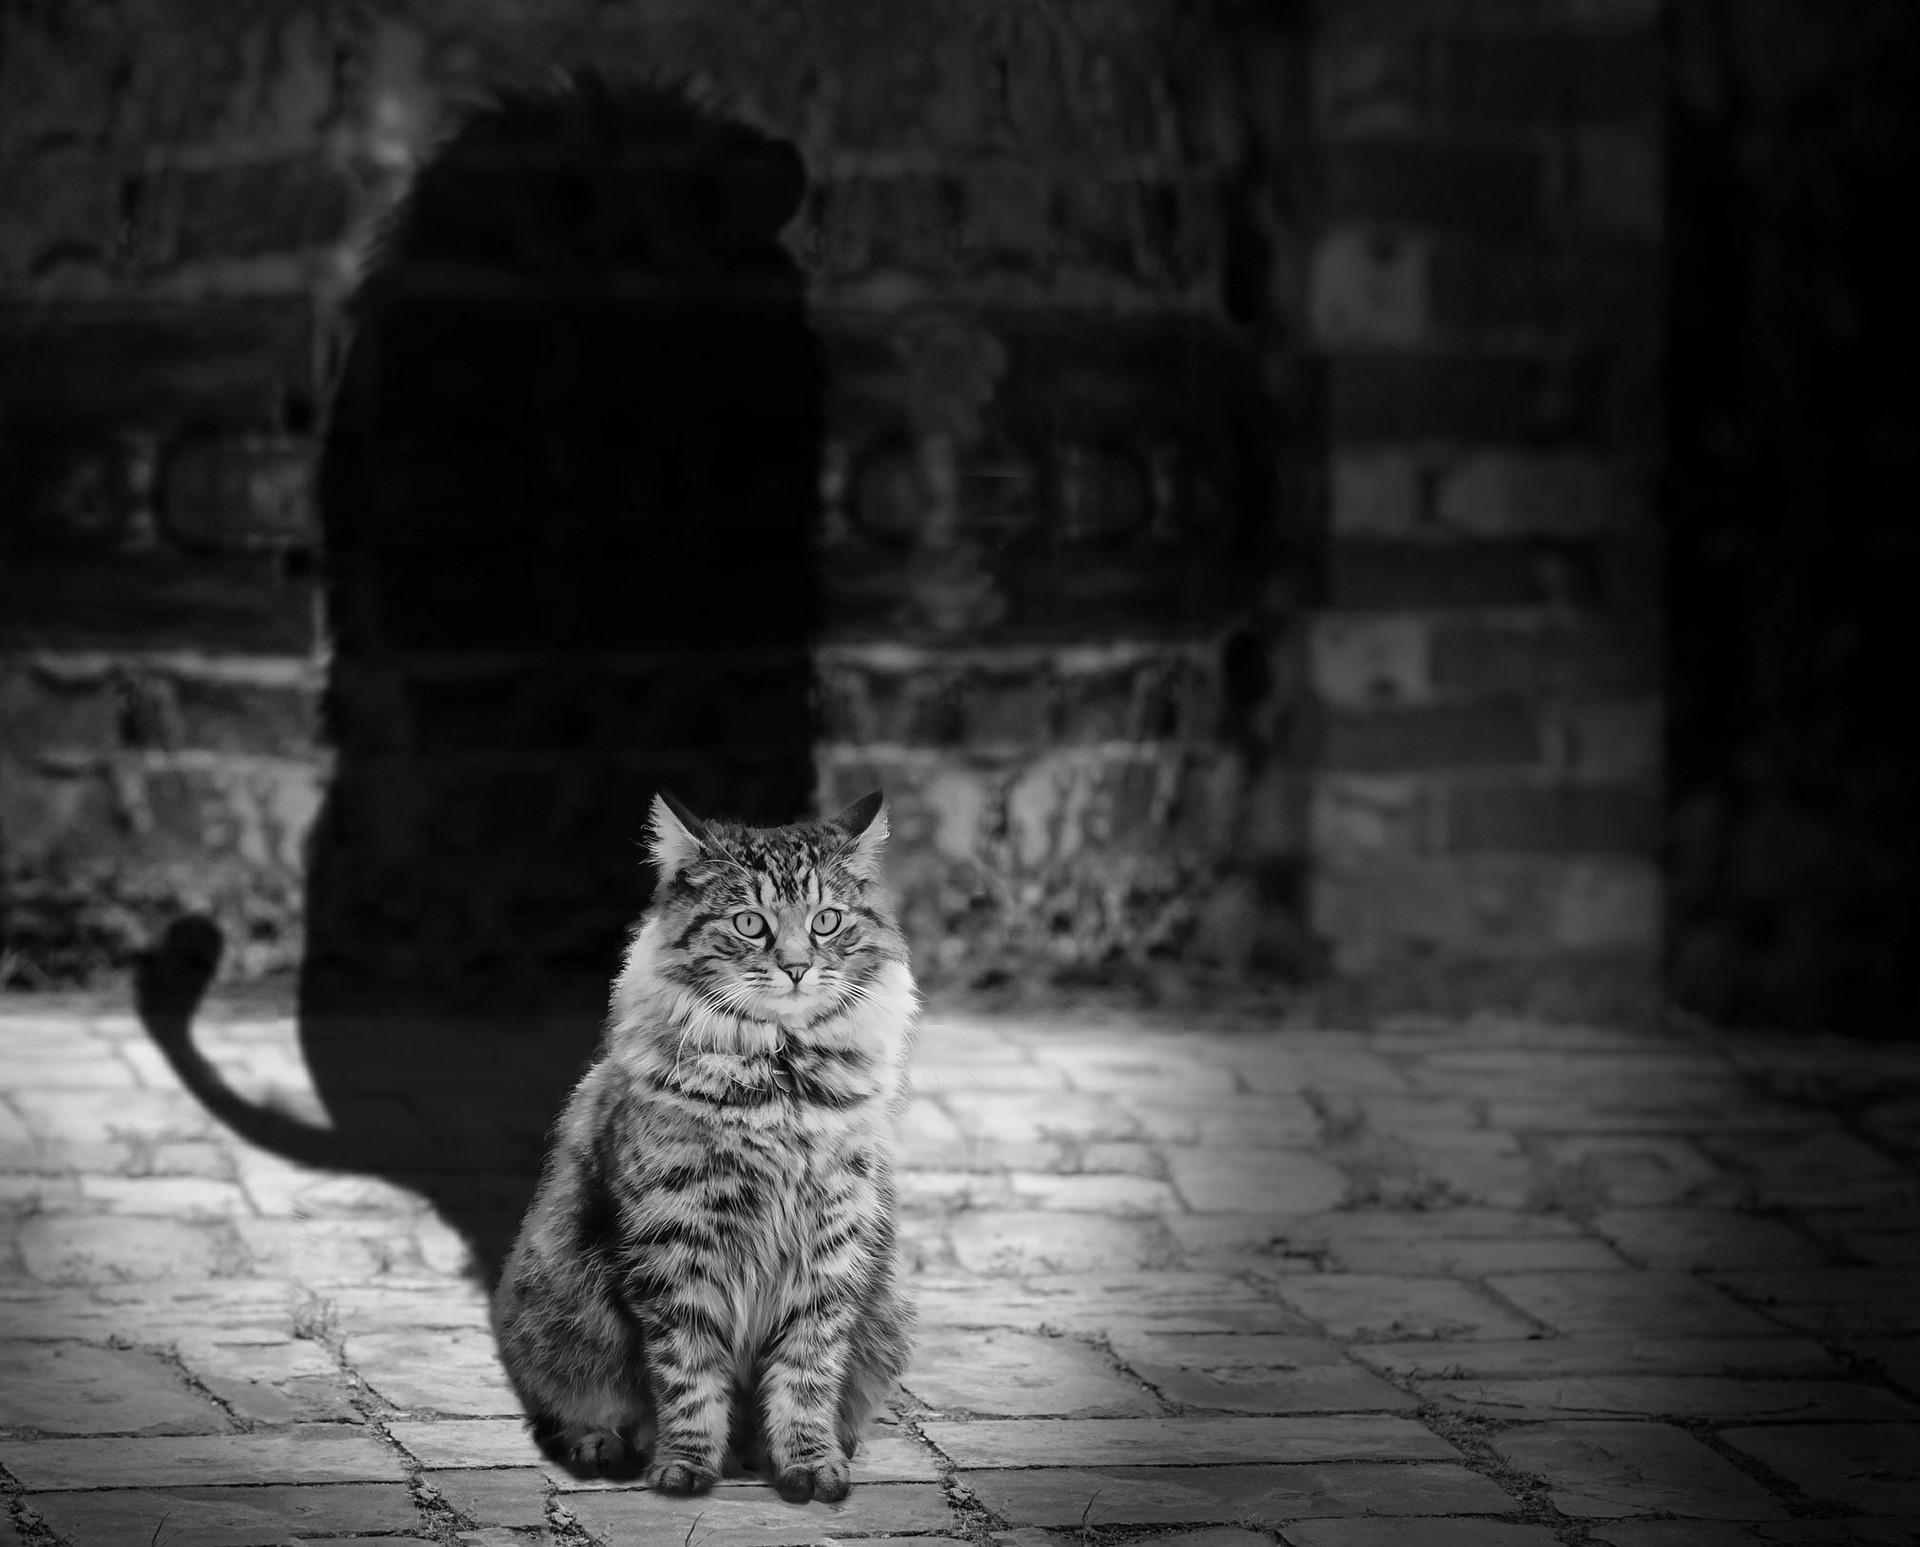 Defeating the predators – a seminar on responsible publishing